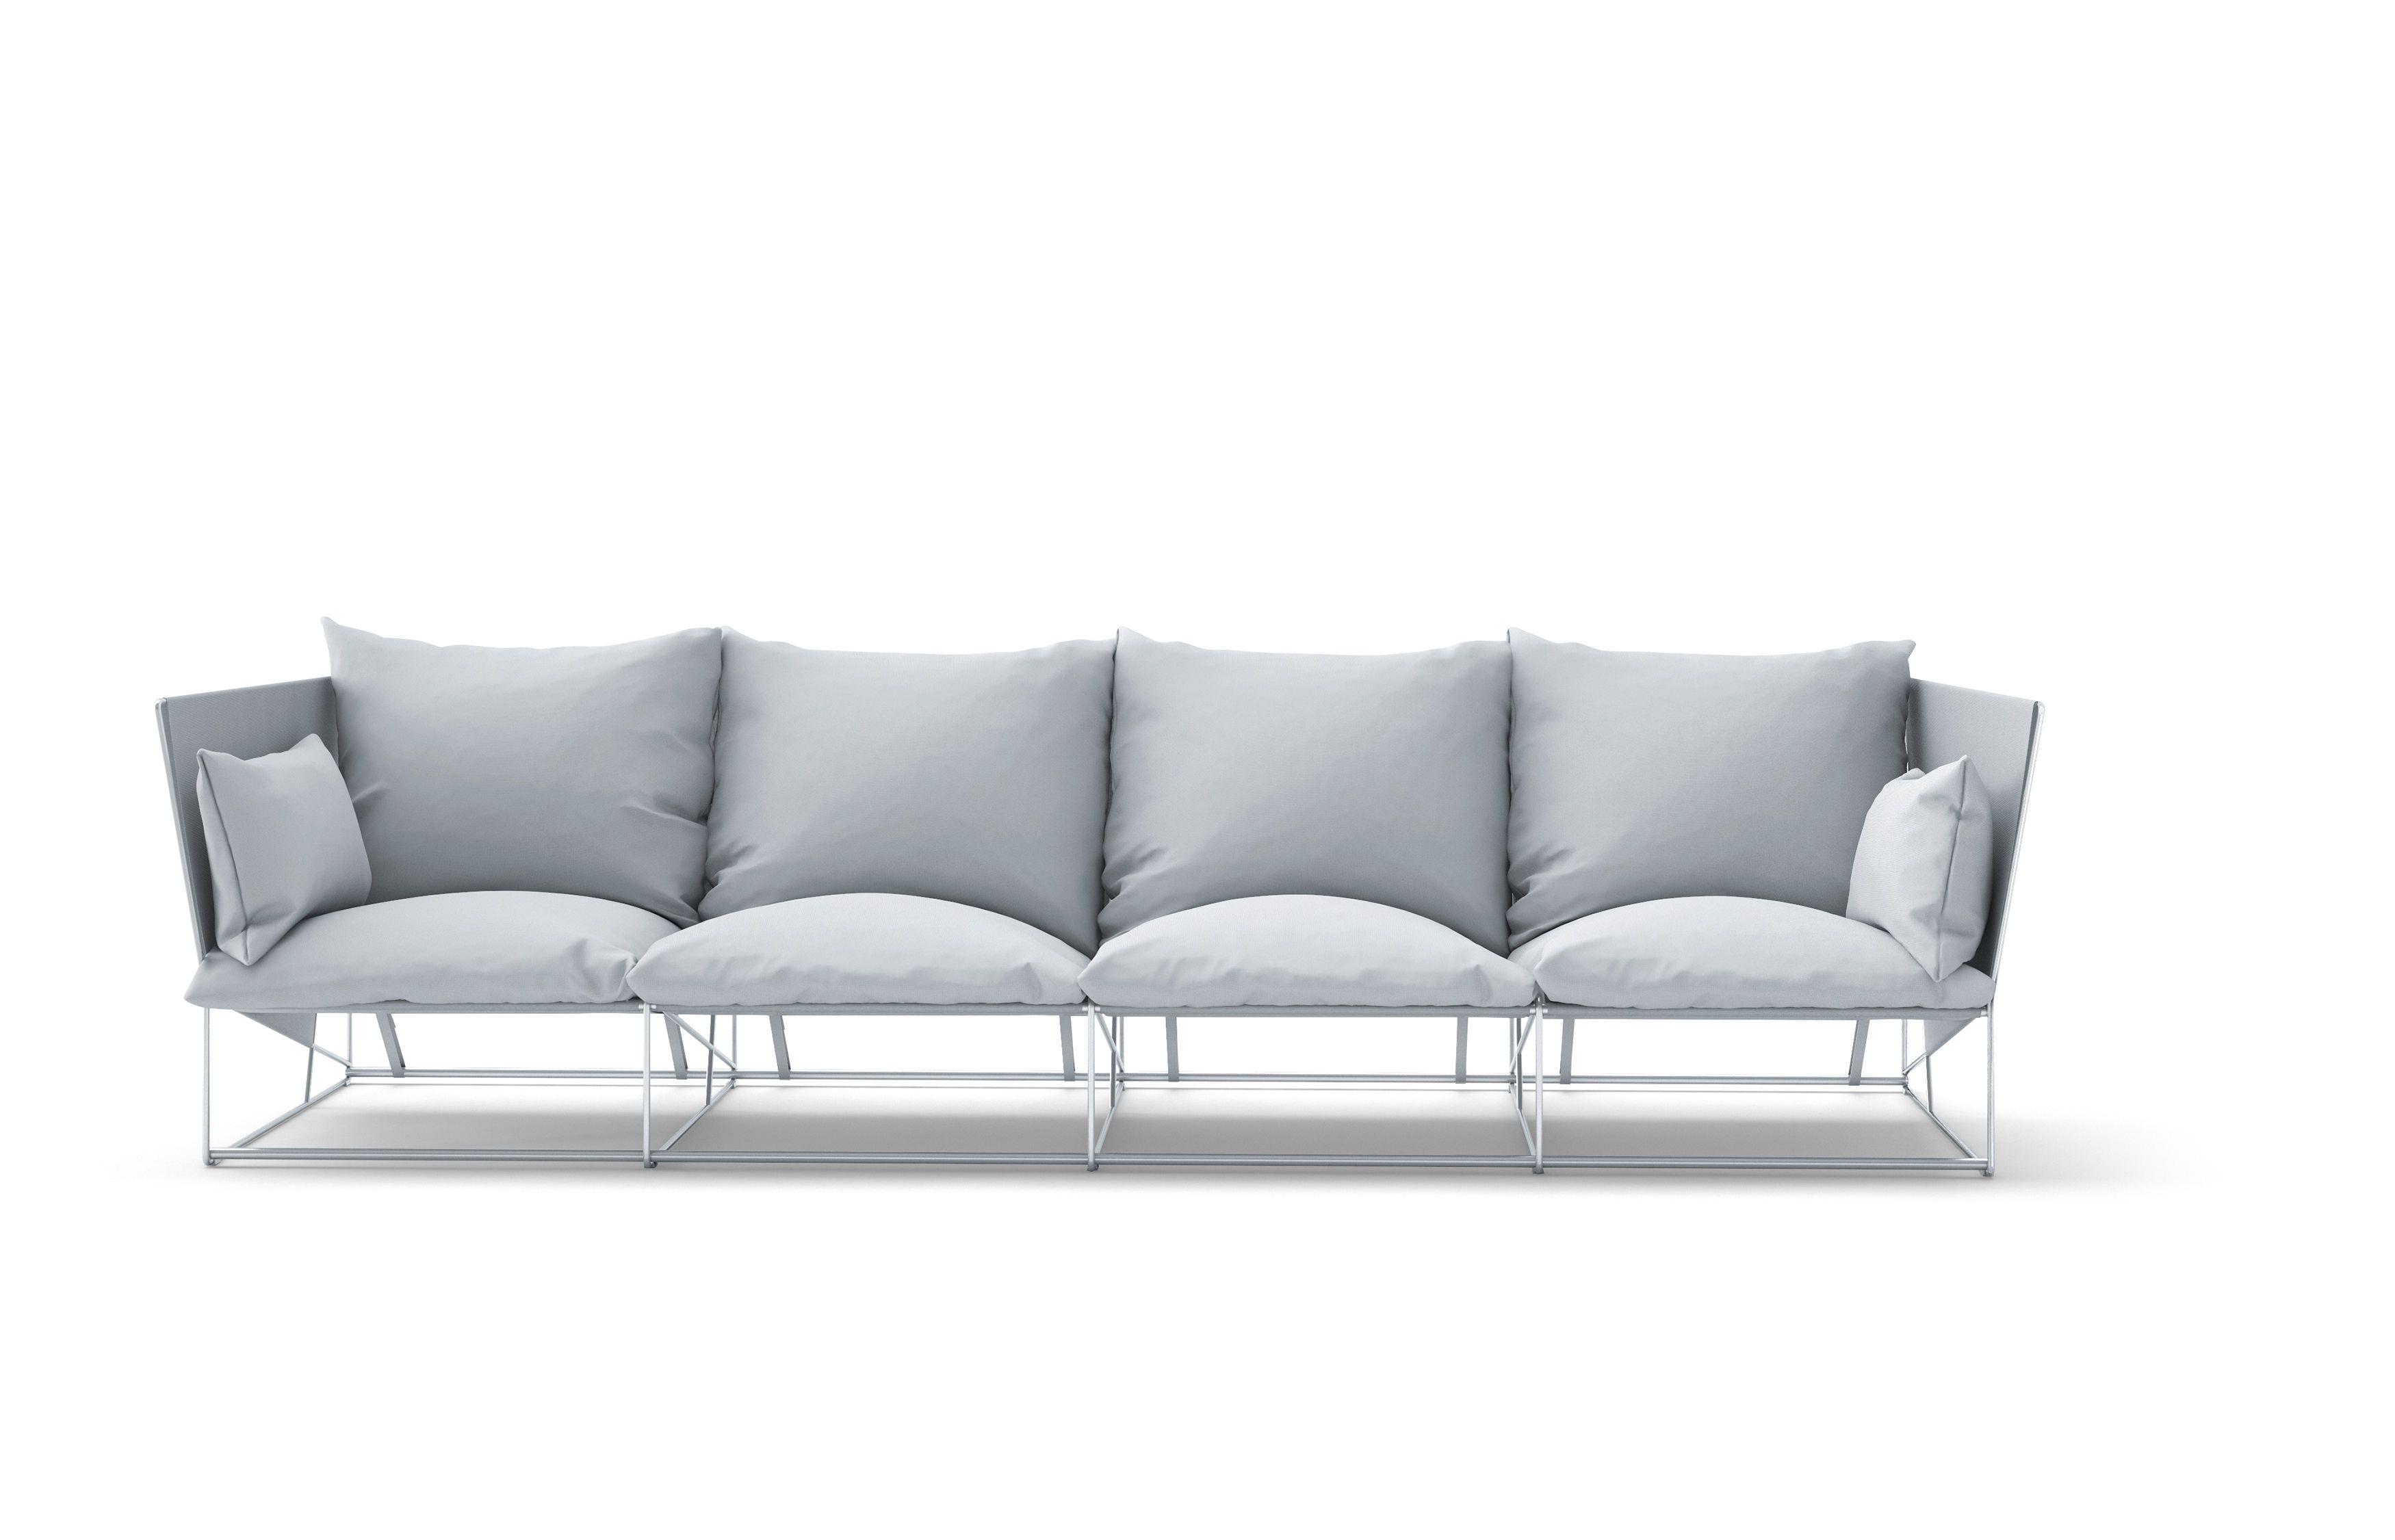 Risultati immagini per ikea havsten Ikea, Design